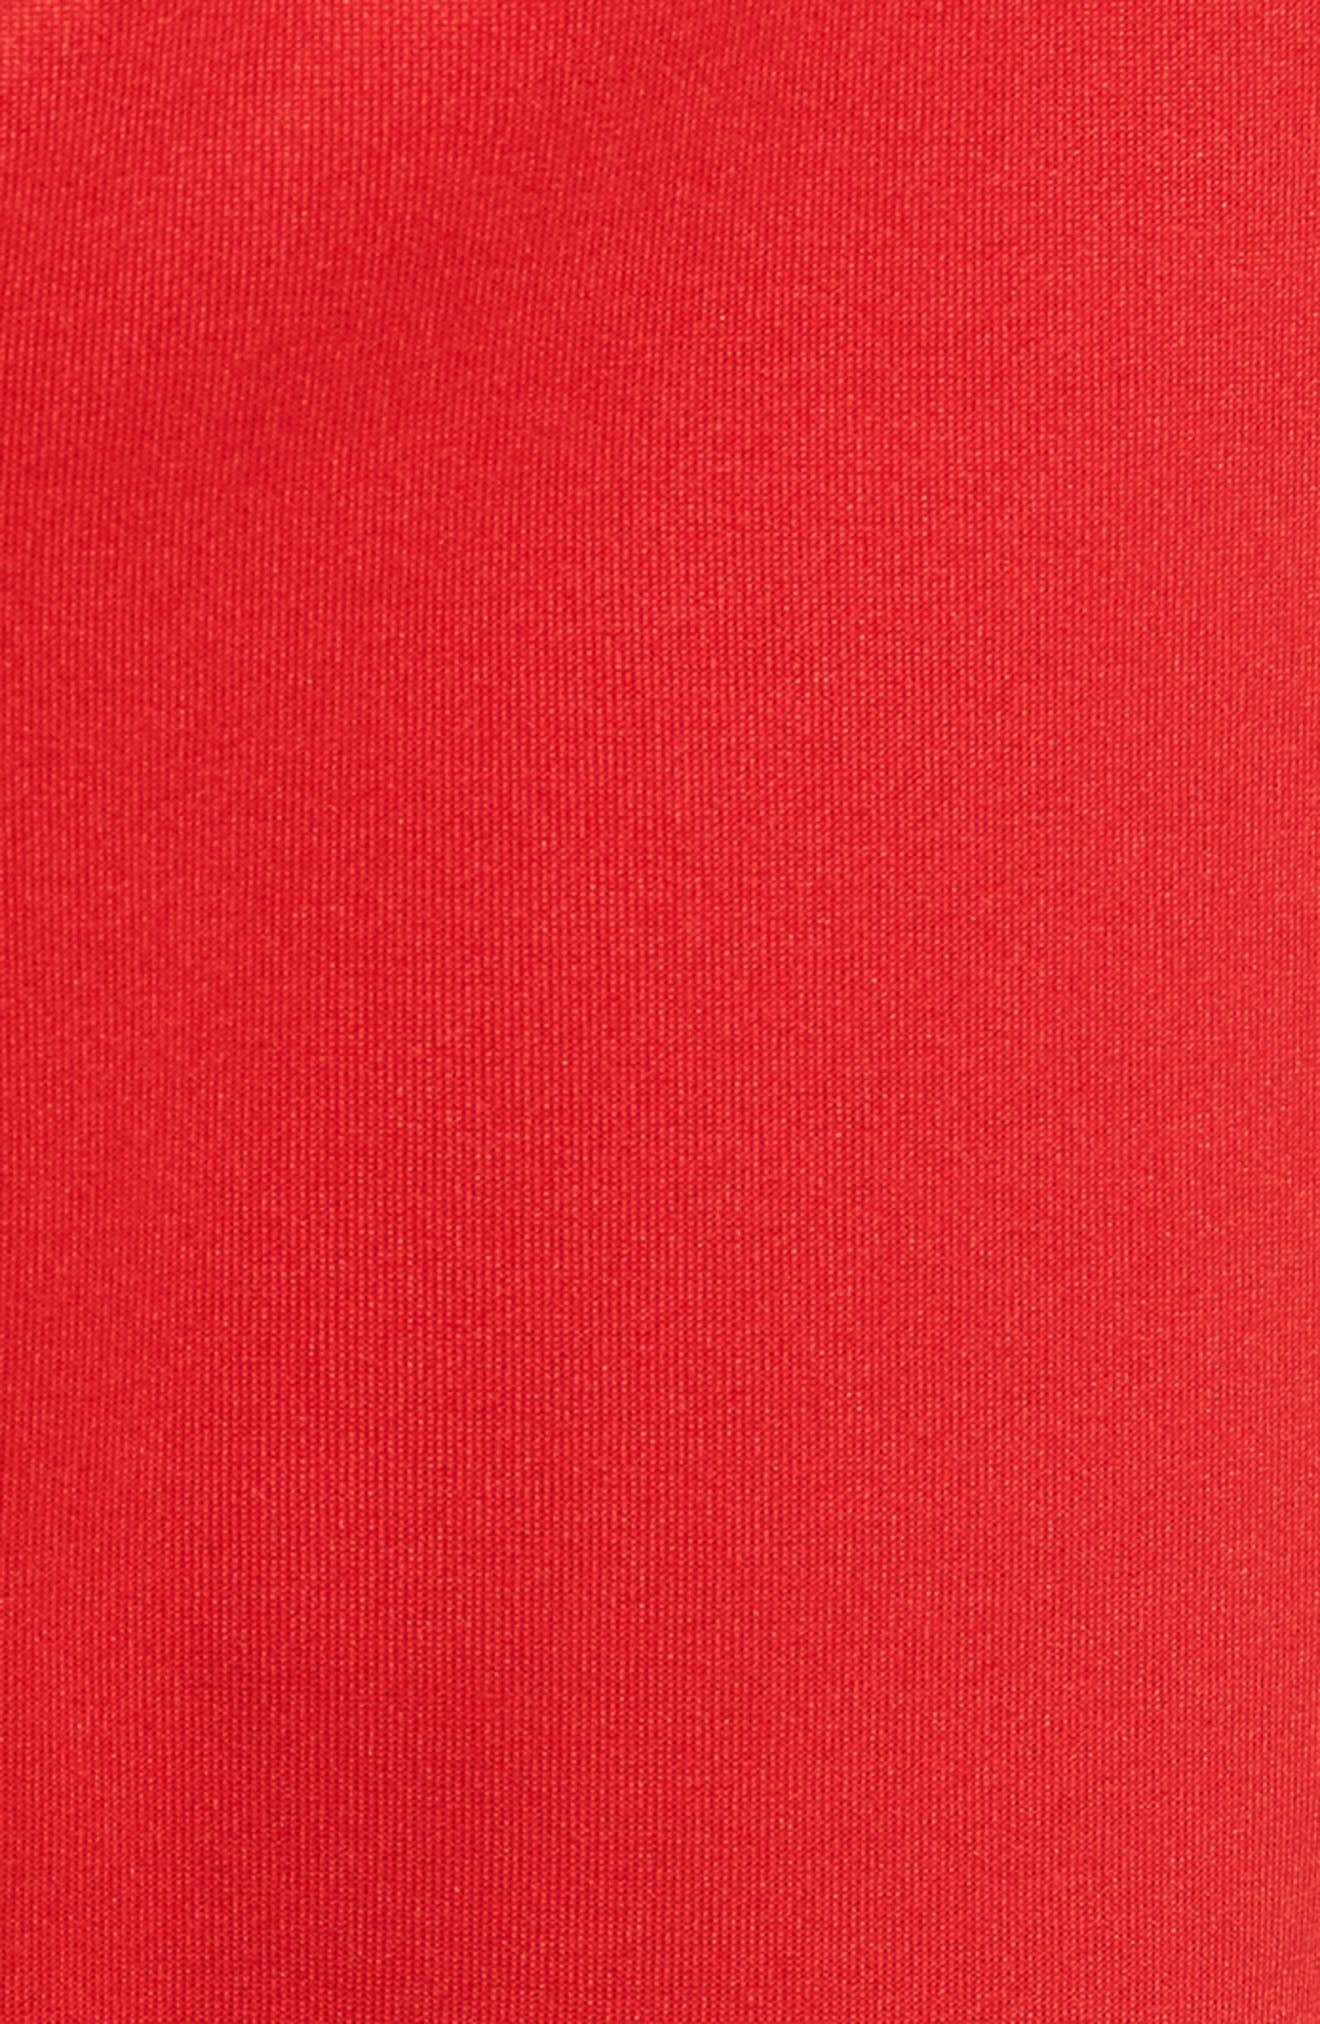 Track Pants,                             Alternate thumbnail 5, color,                             Scarlet